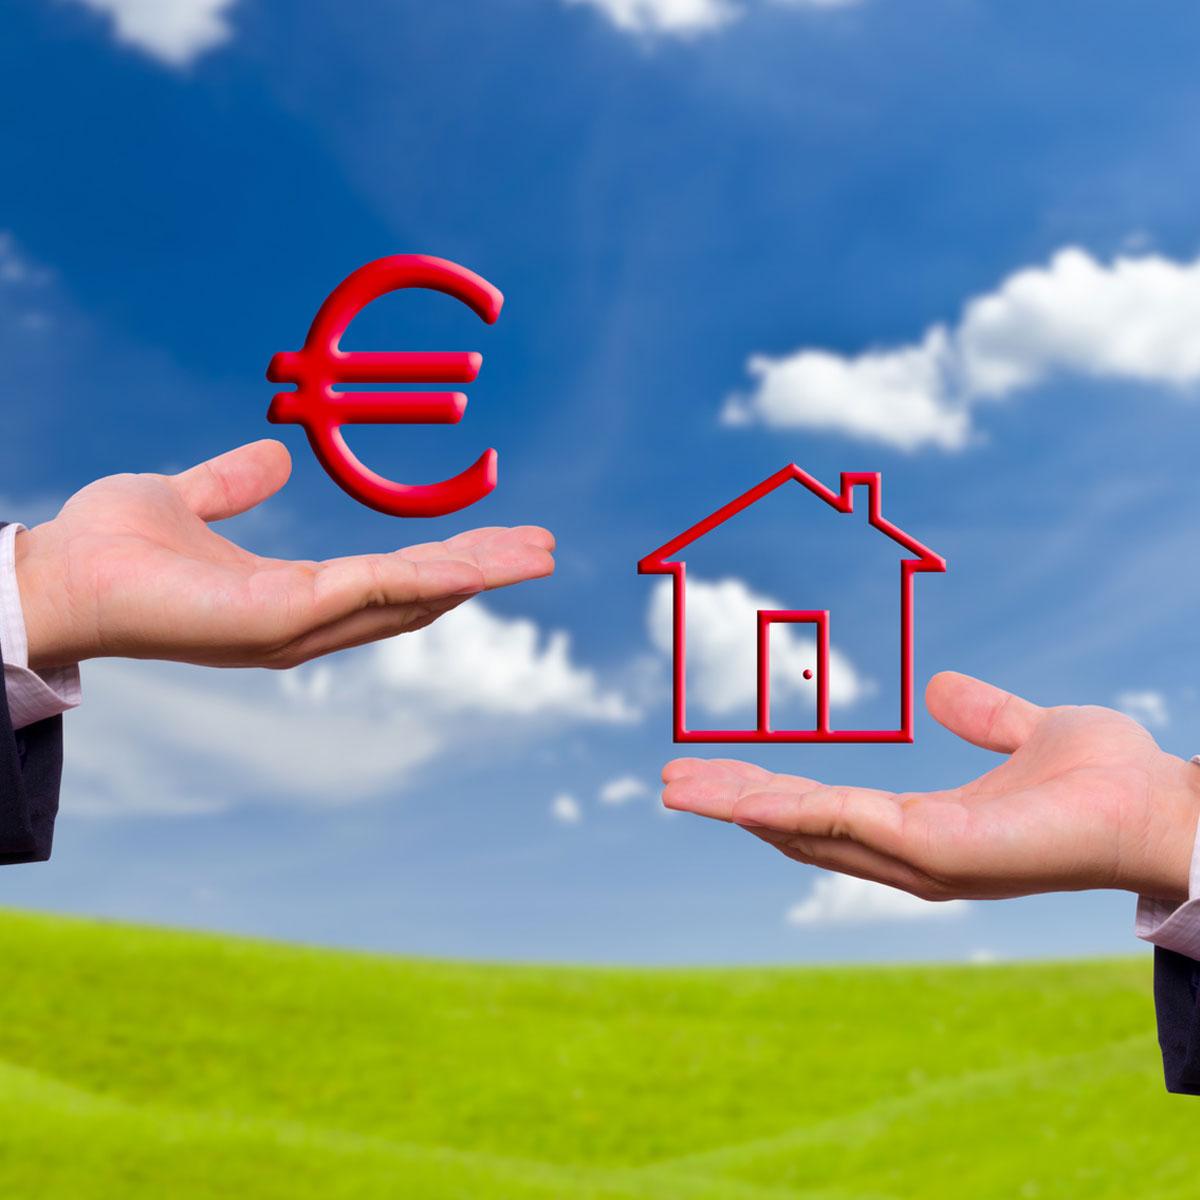 symbole euros pelouse maison